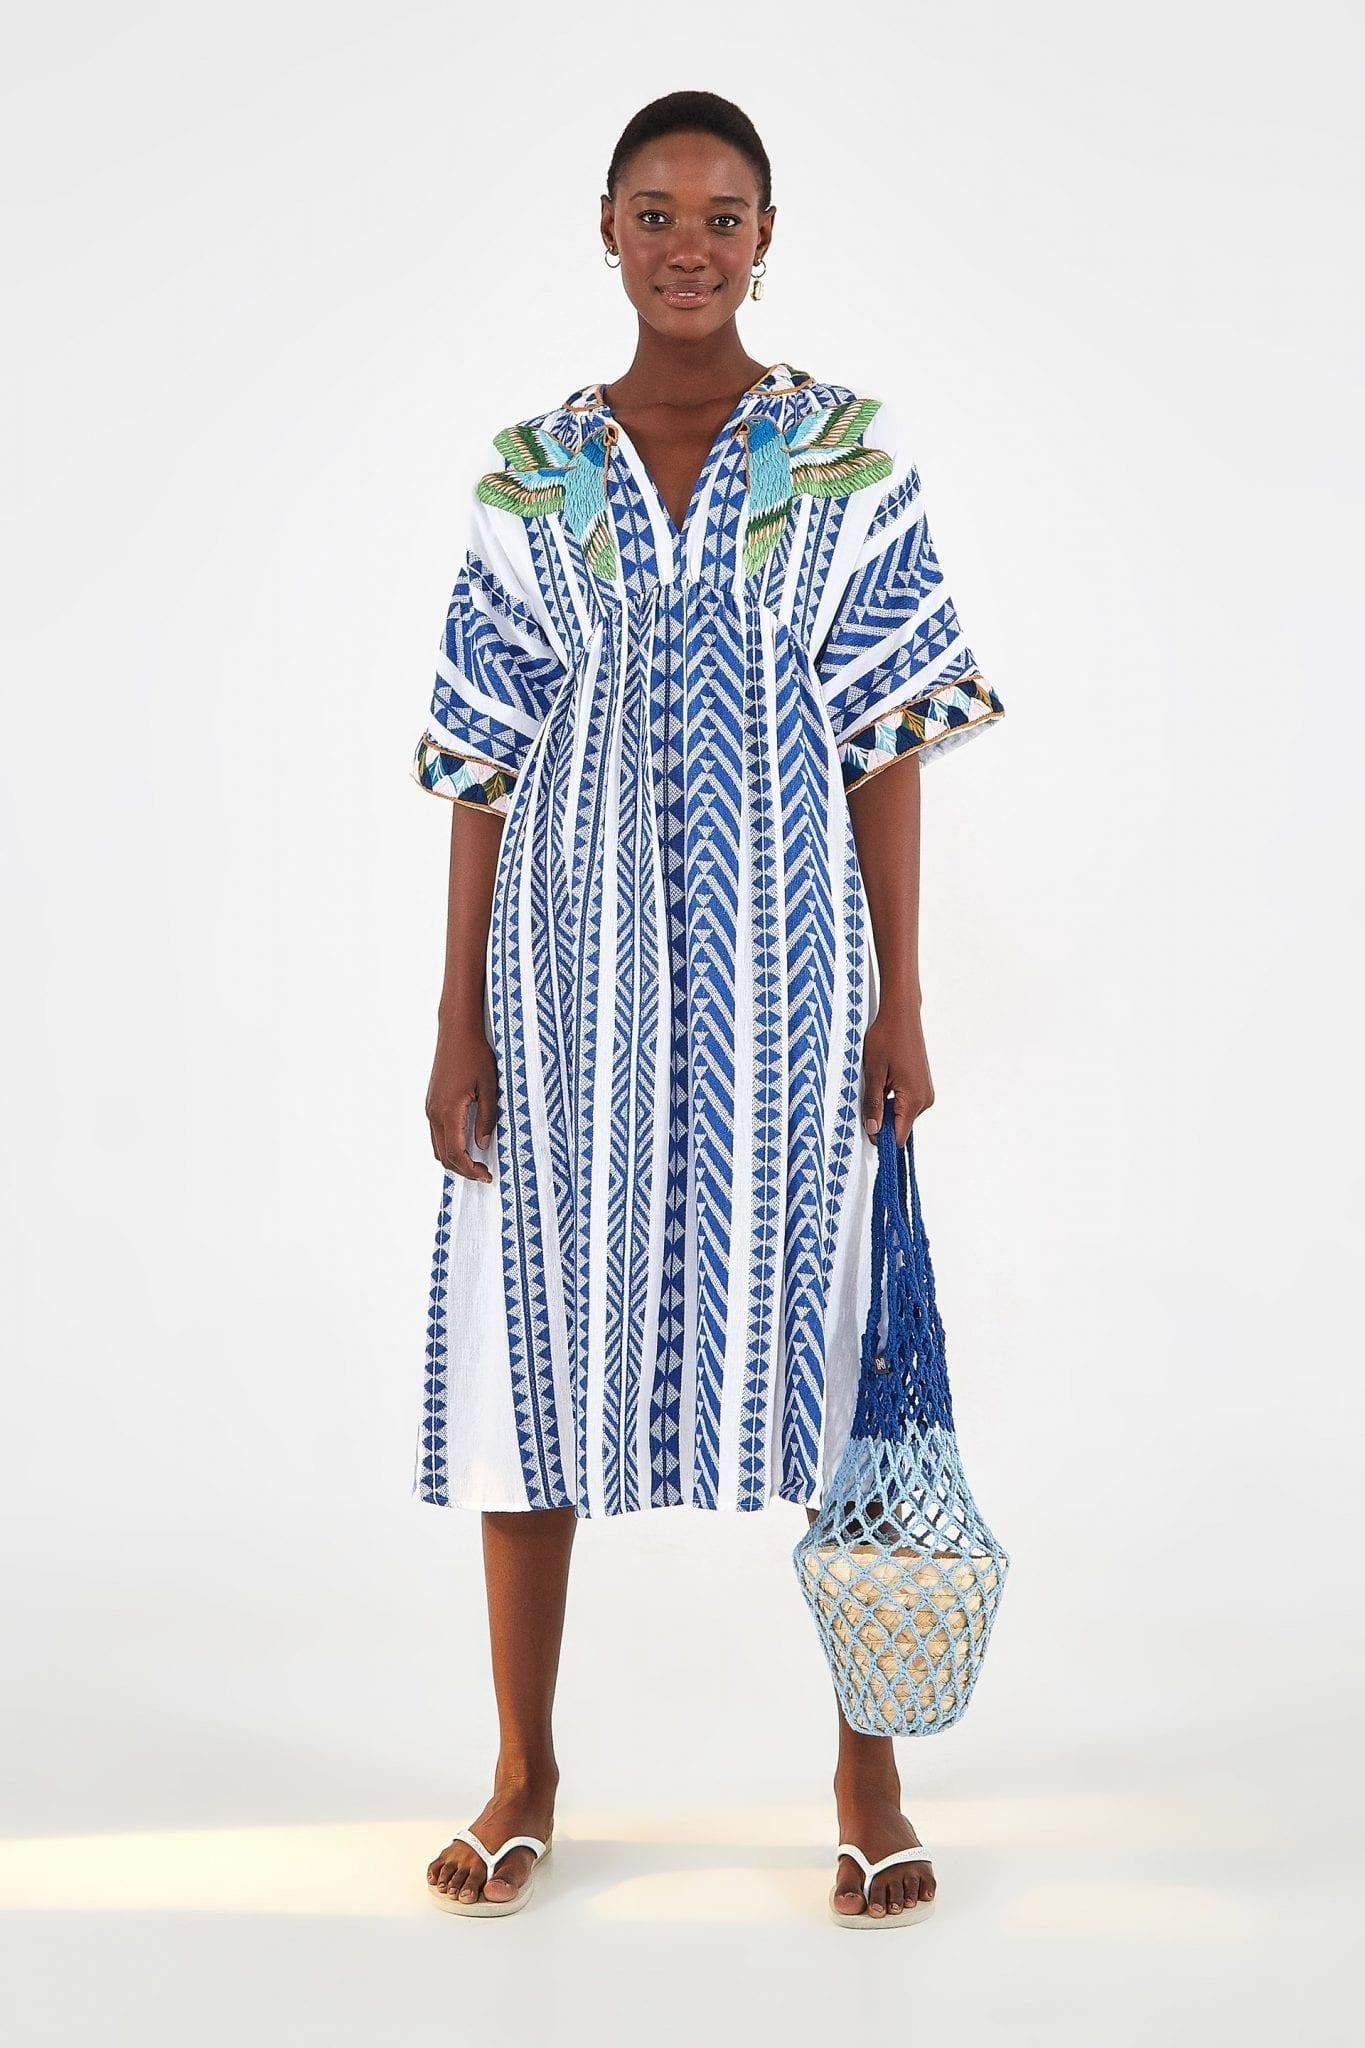 FARMRIO Jacquard Embroidery Dress